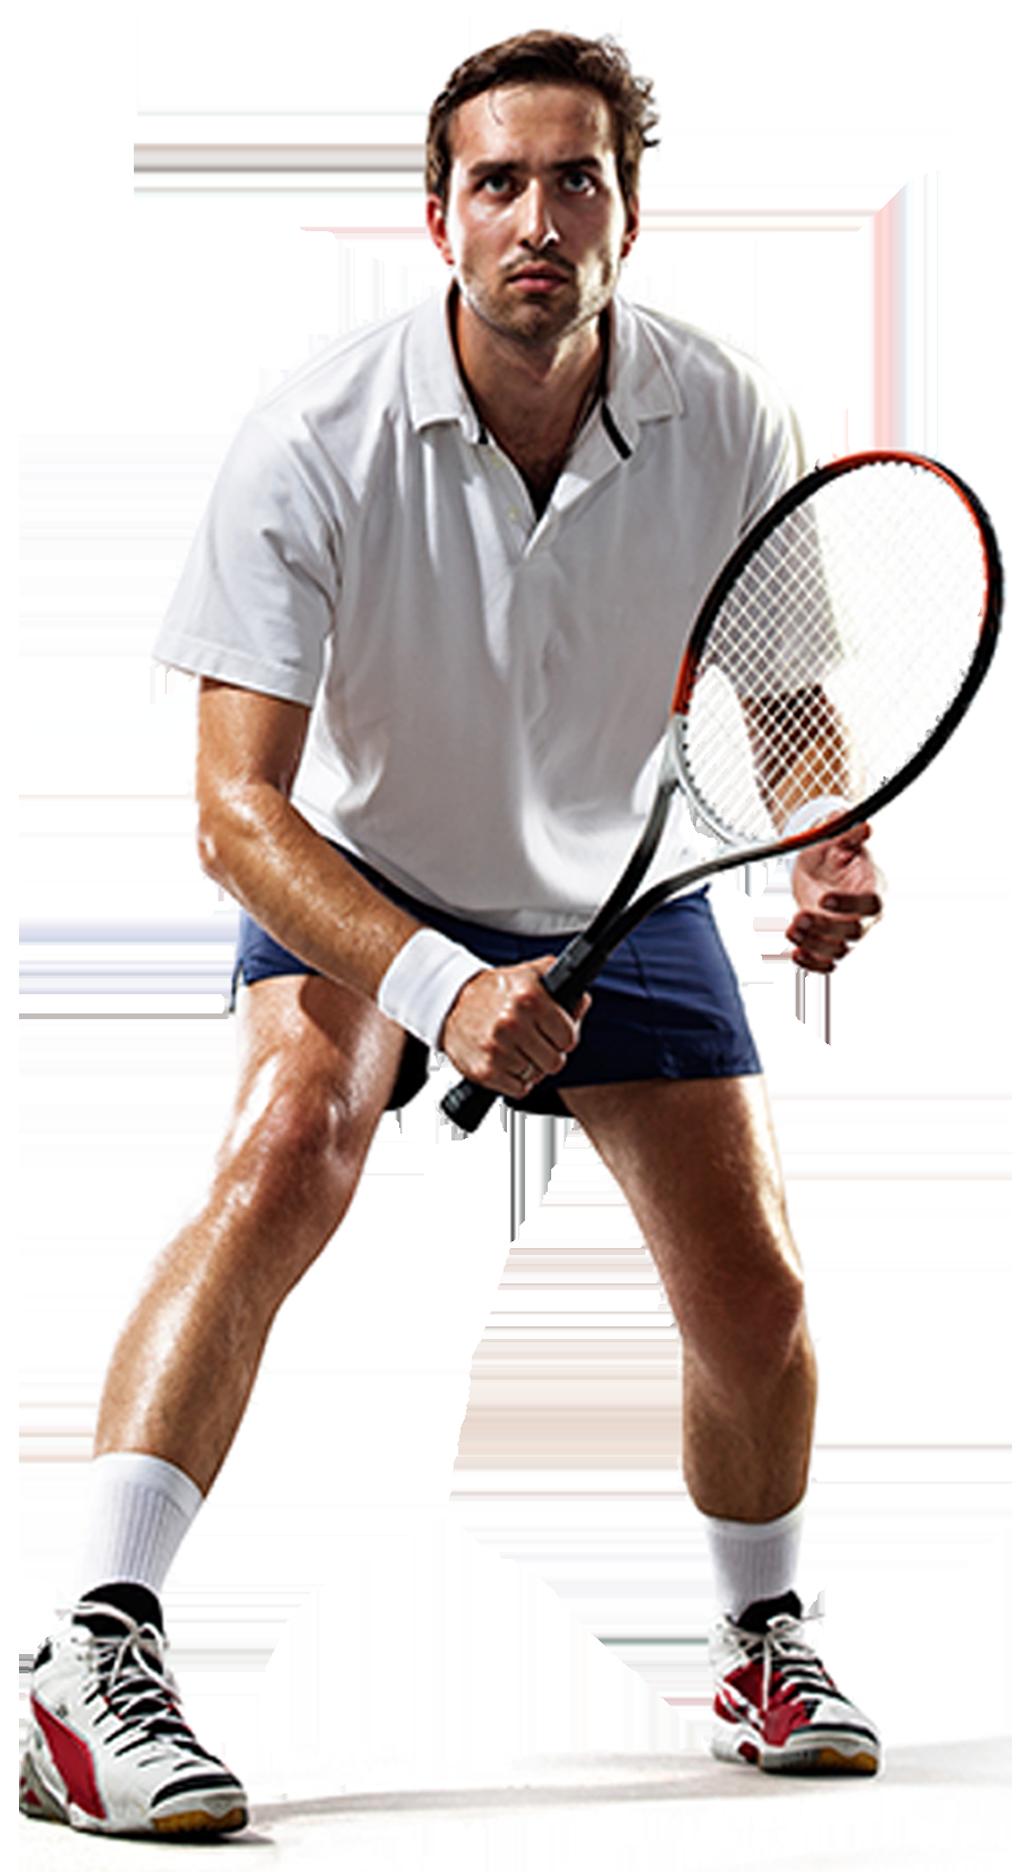 Tenis - Aydın EA Akademi SPA